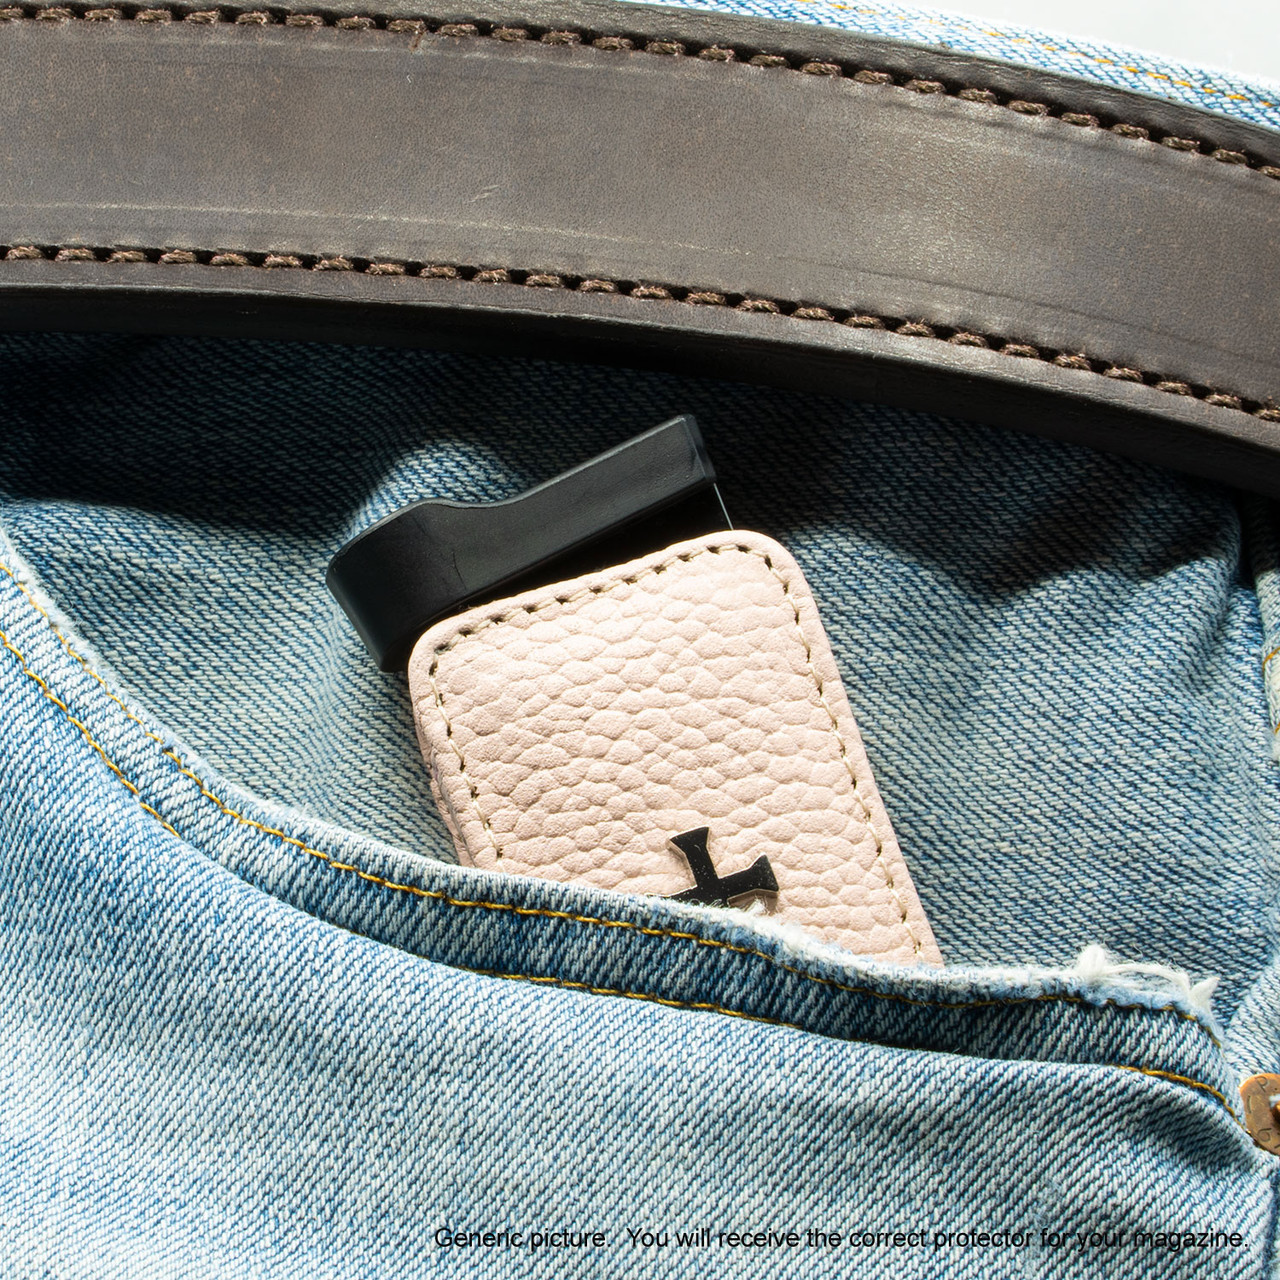 Springfield Micro Compact Pink Carry Faithfully Cross Magazine Pocket Protector